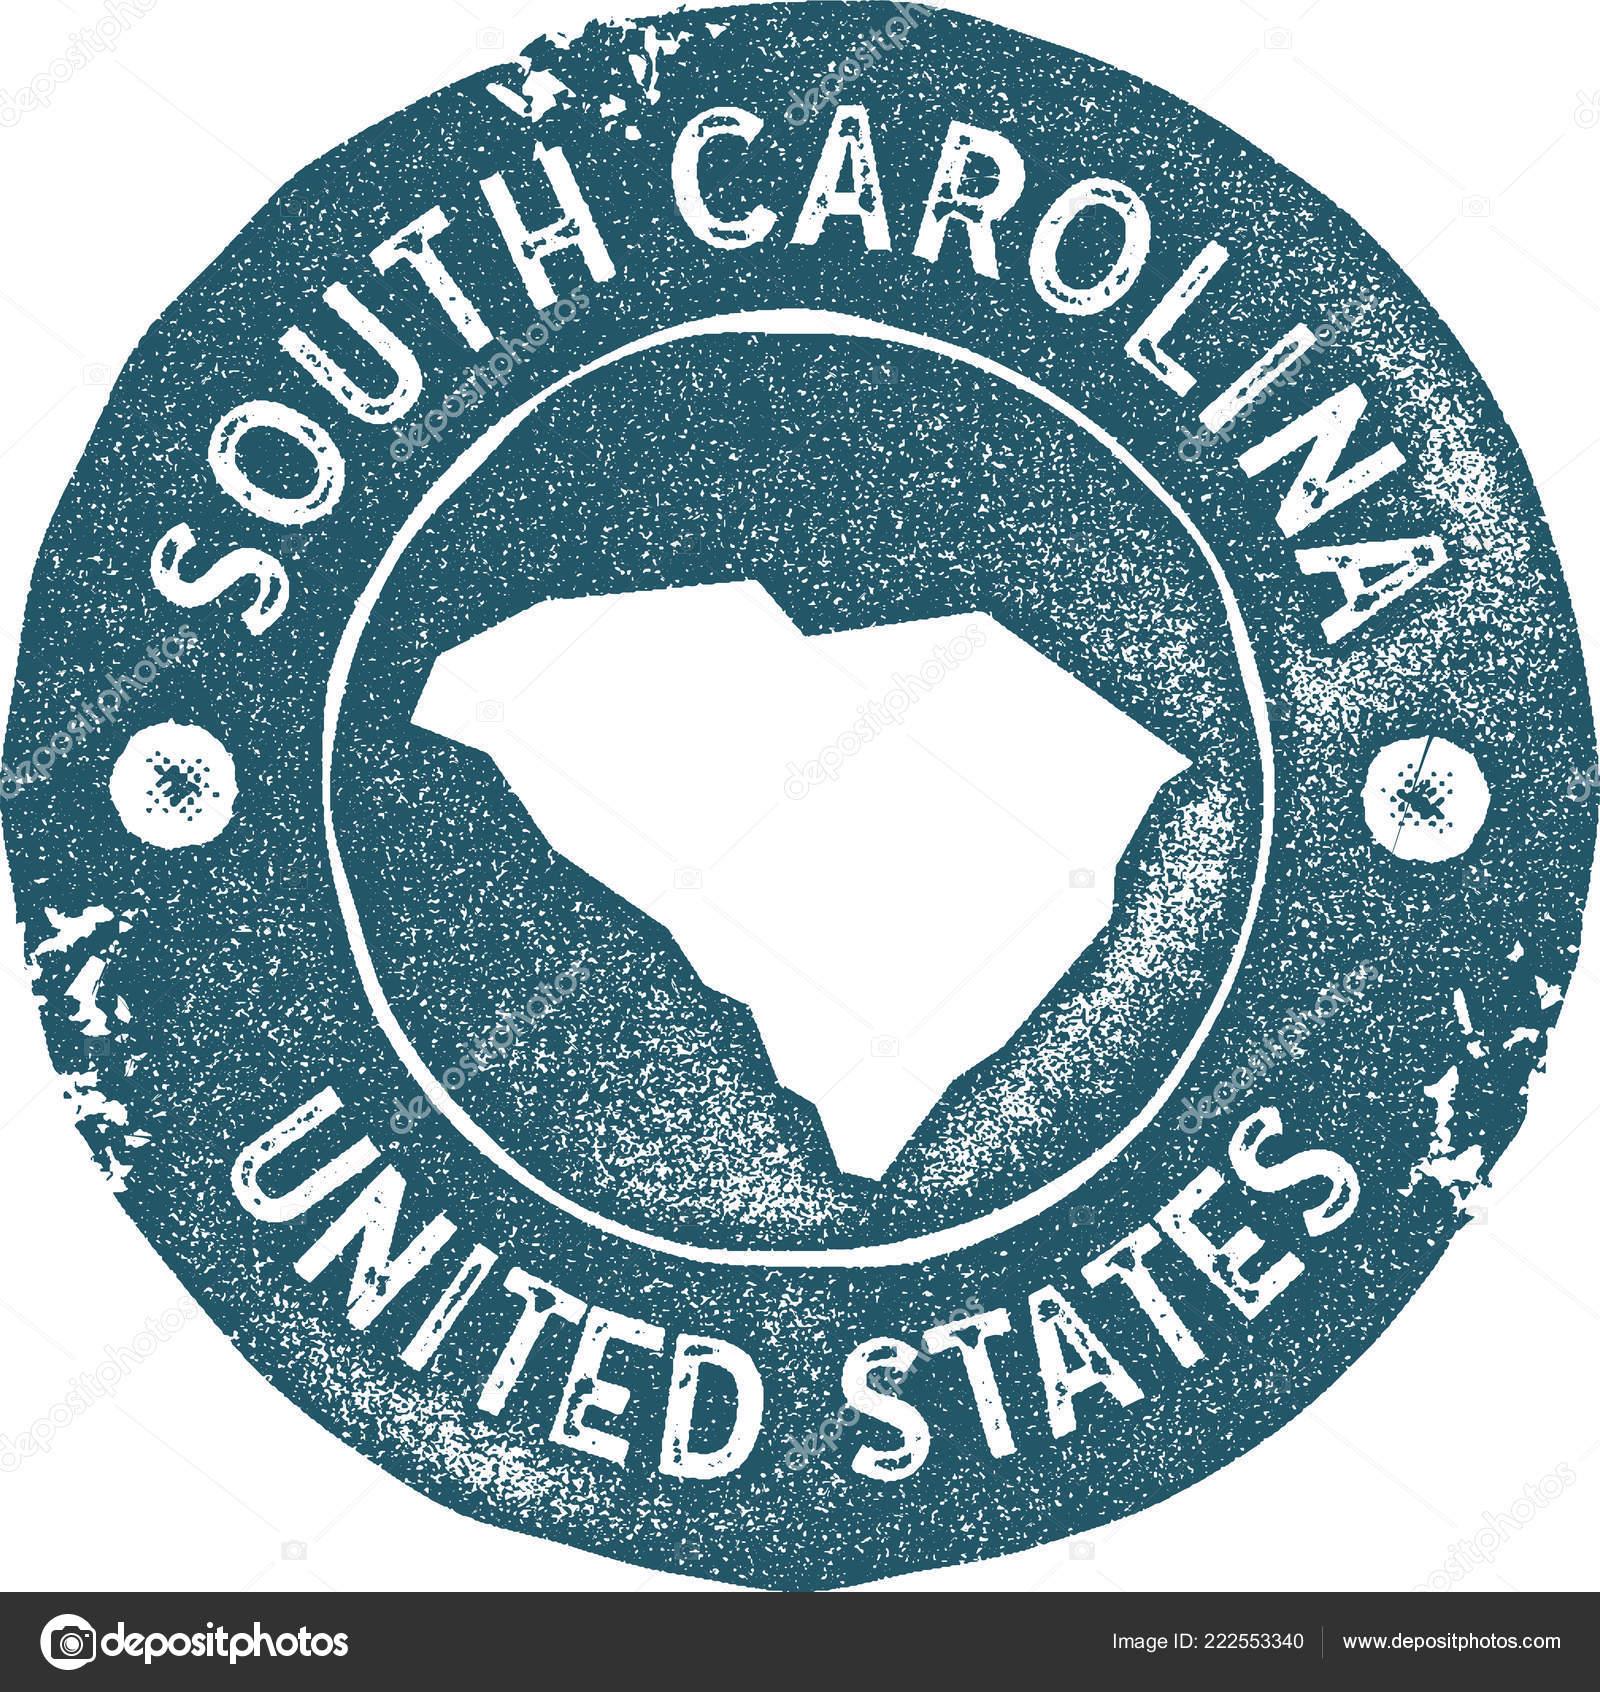 Vintage South Carolina Map.South Carolina Map Vintage Stamp Retro Style Handmade Label Badge Or